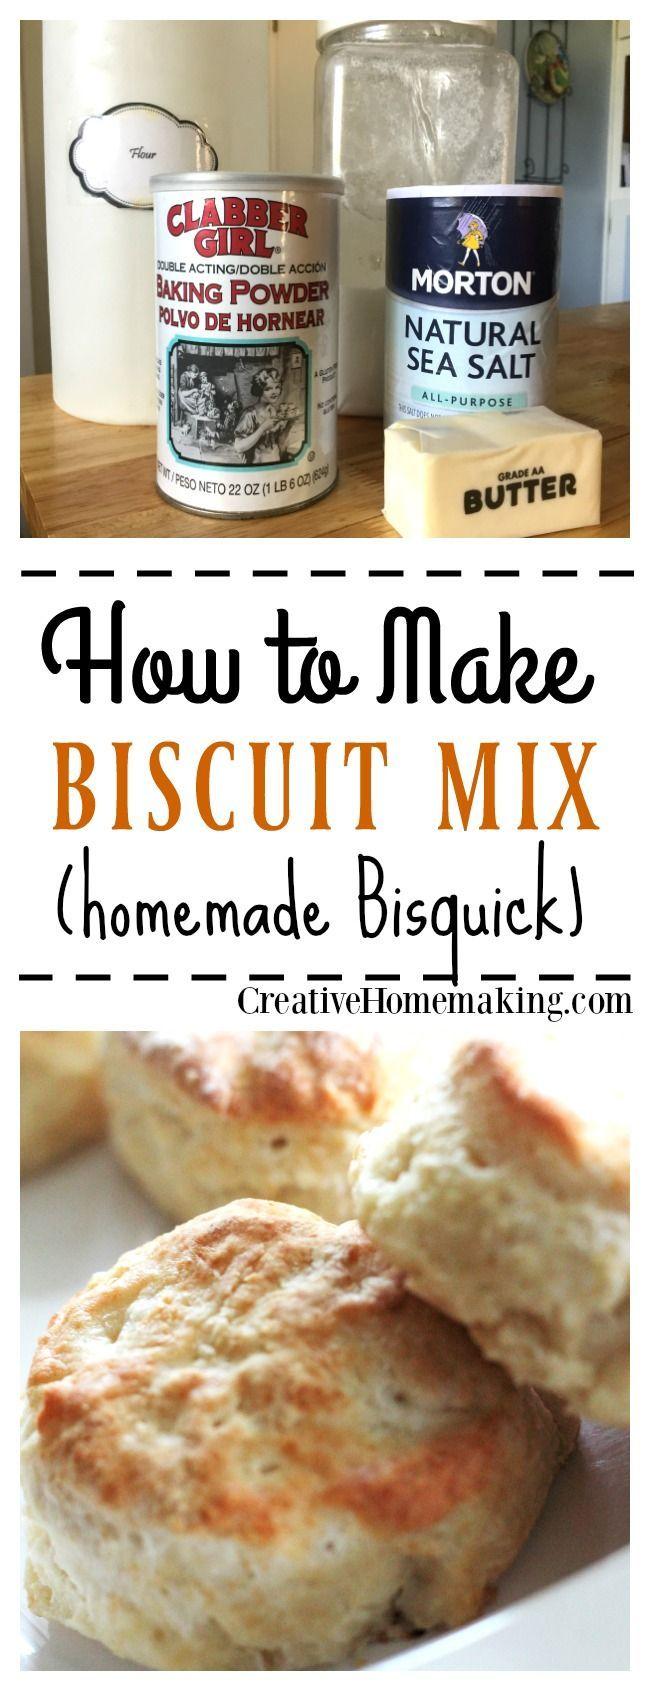 Homemade Bisquick Baking Mix Homemade Bisquick Baking Mix Recipes Homemade Biscuits